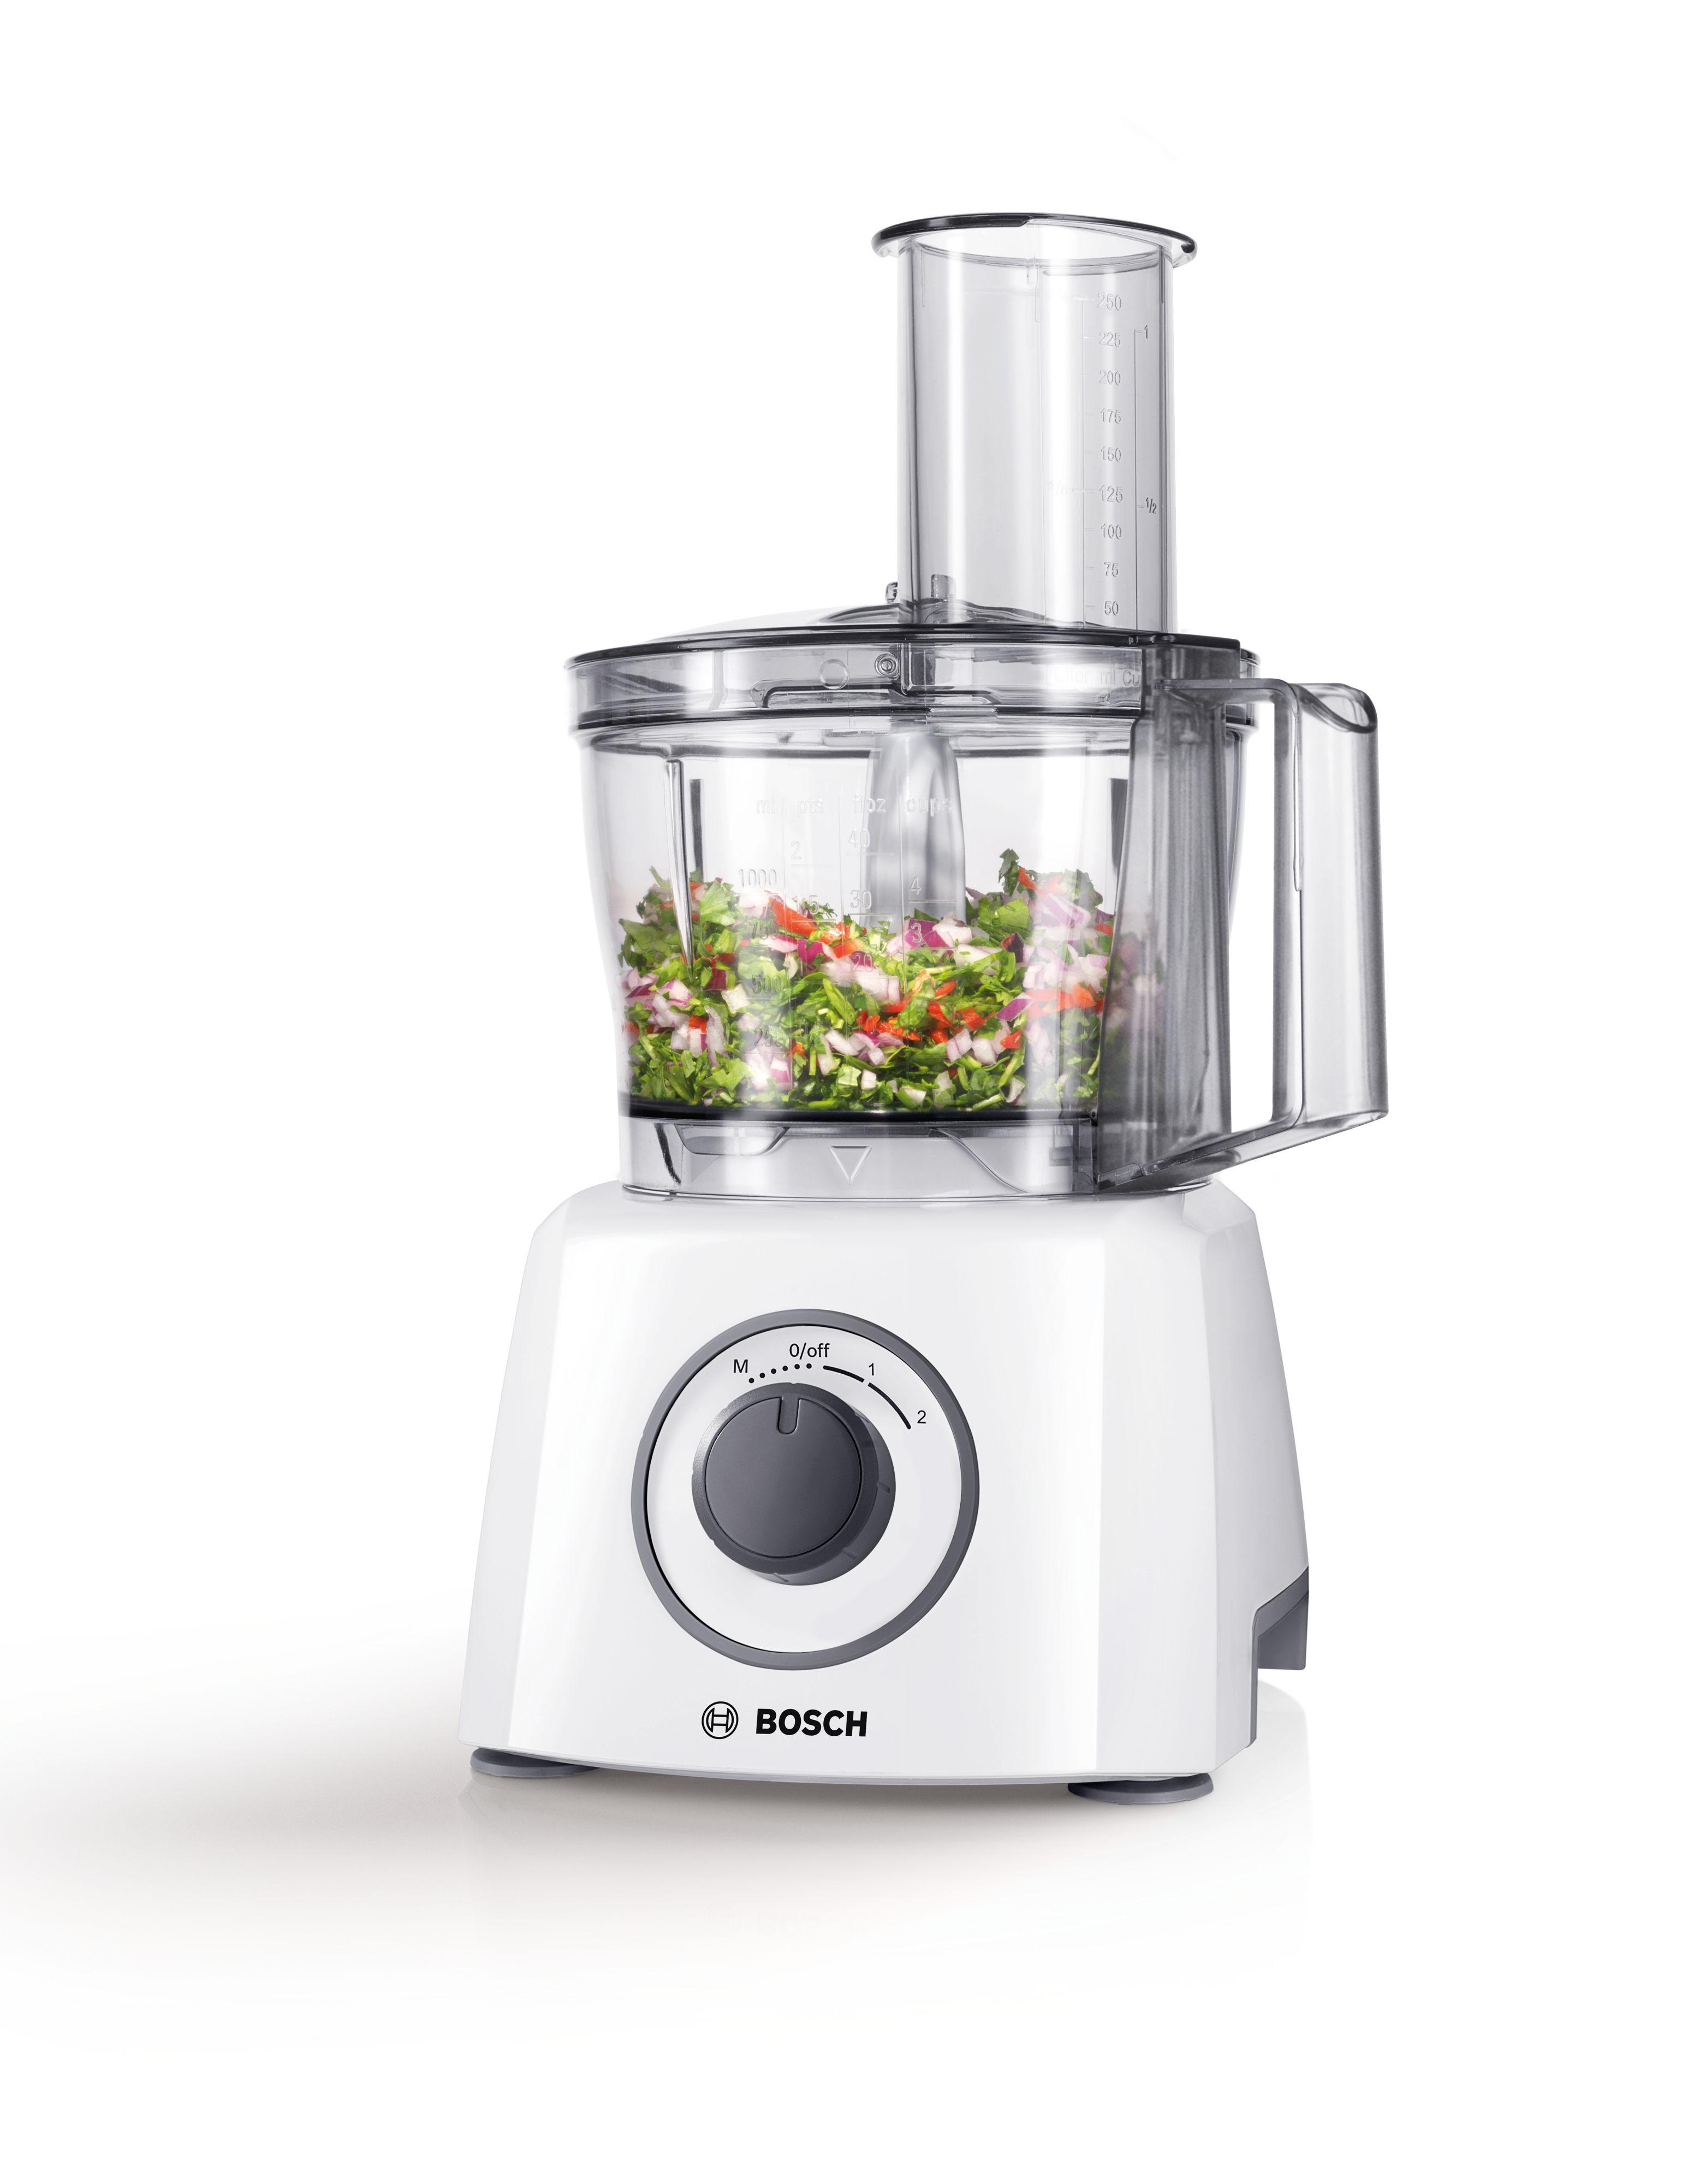 Kompaktni kuhinjski aparat 800 W bela / siva